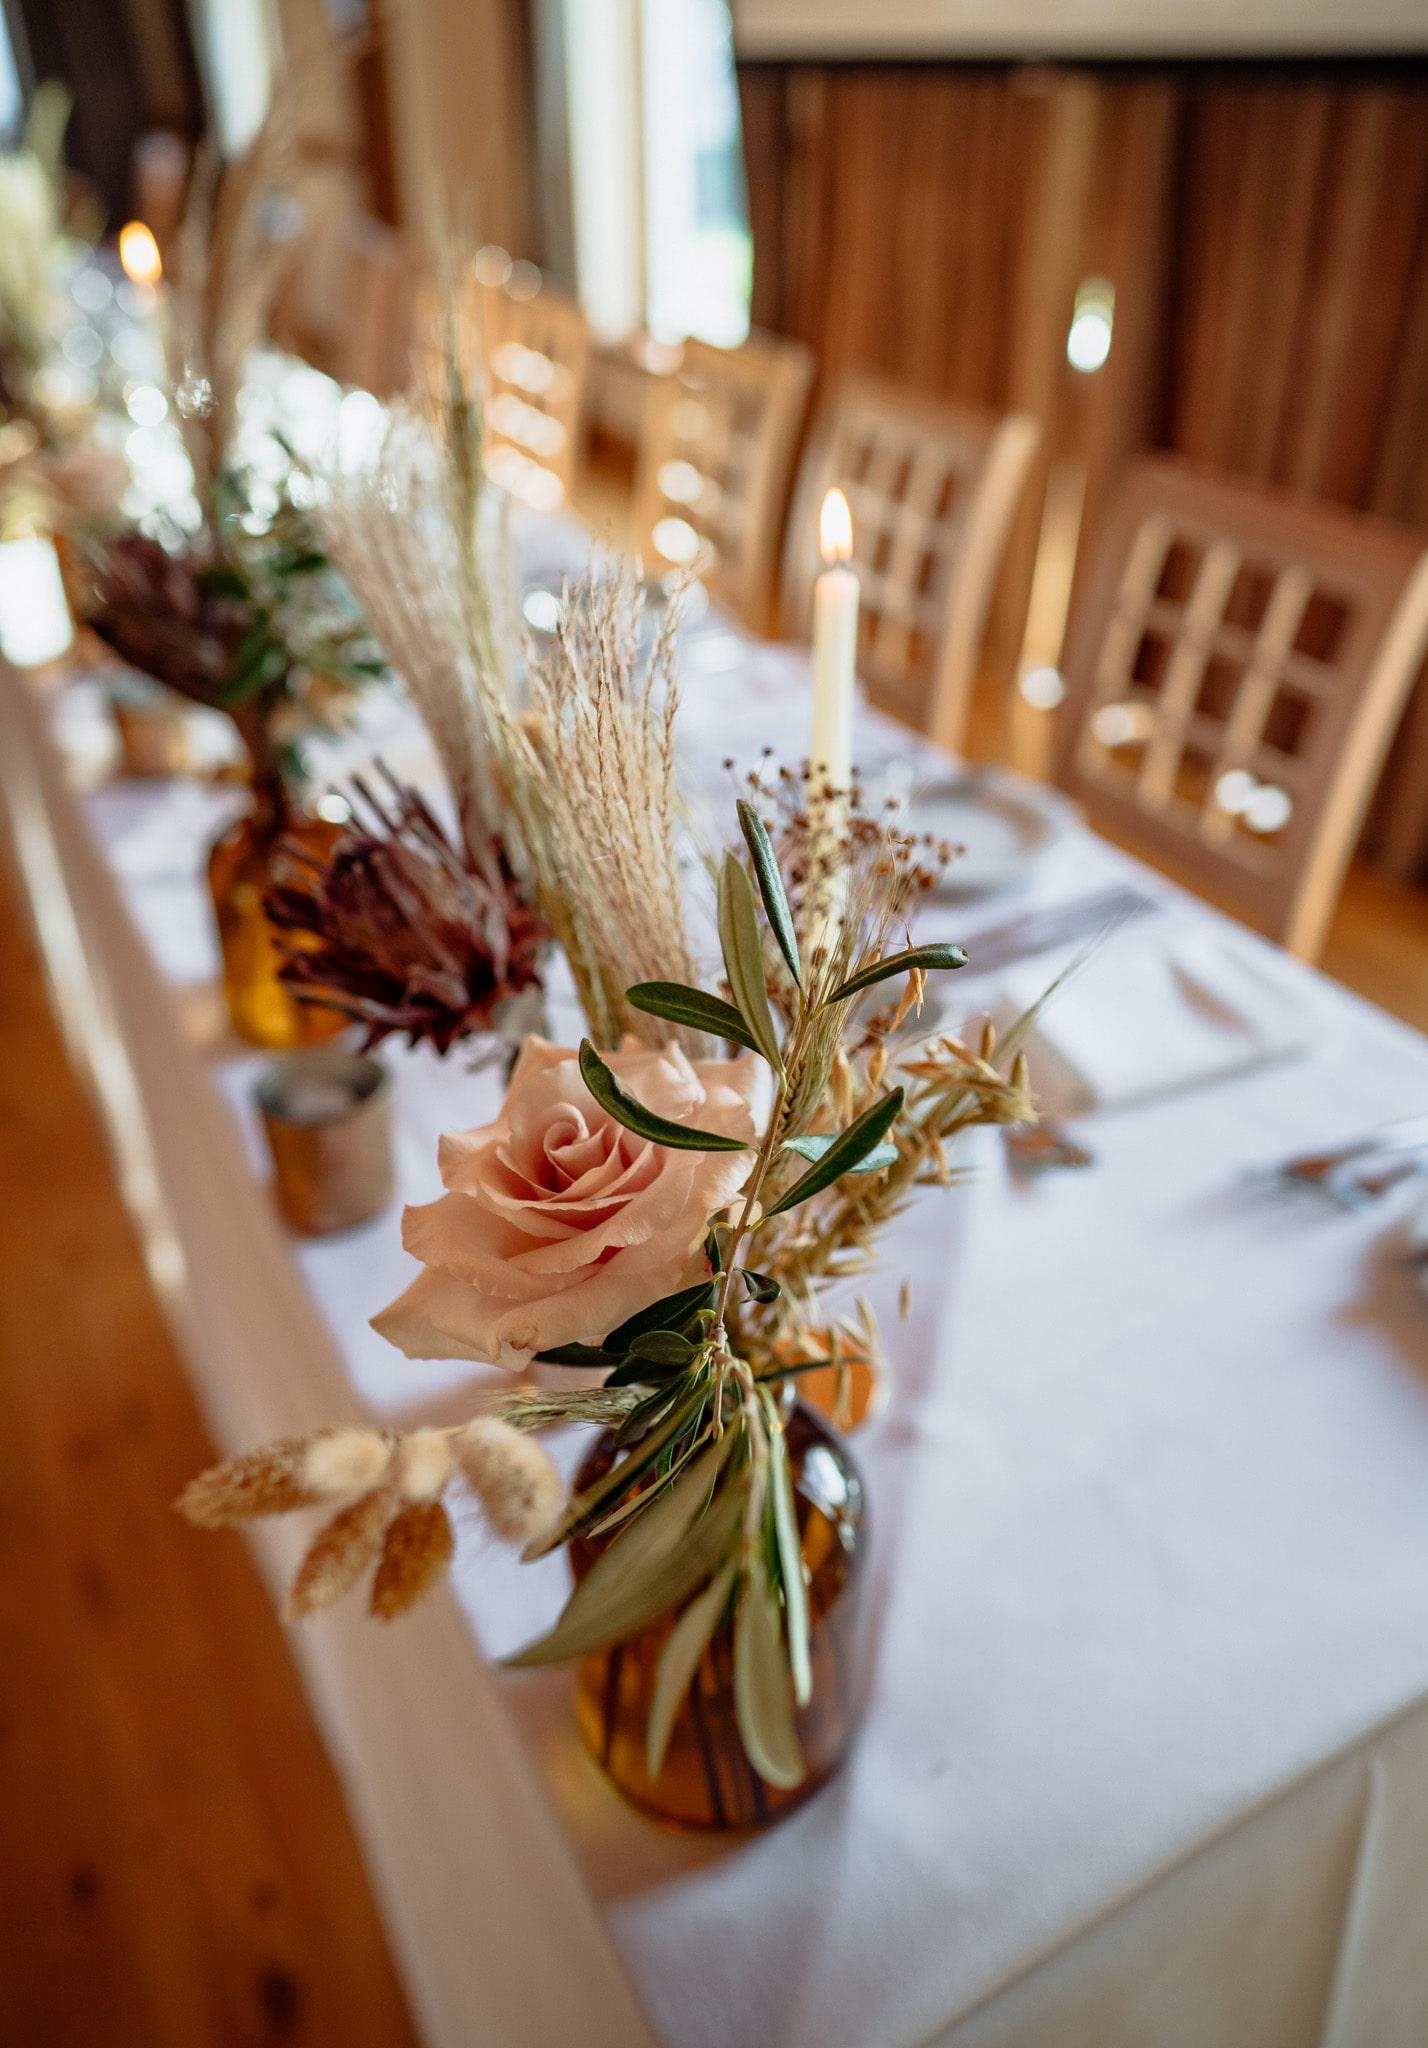 Swansea wedding venues